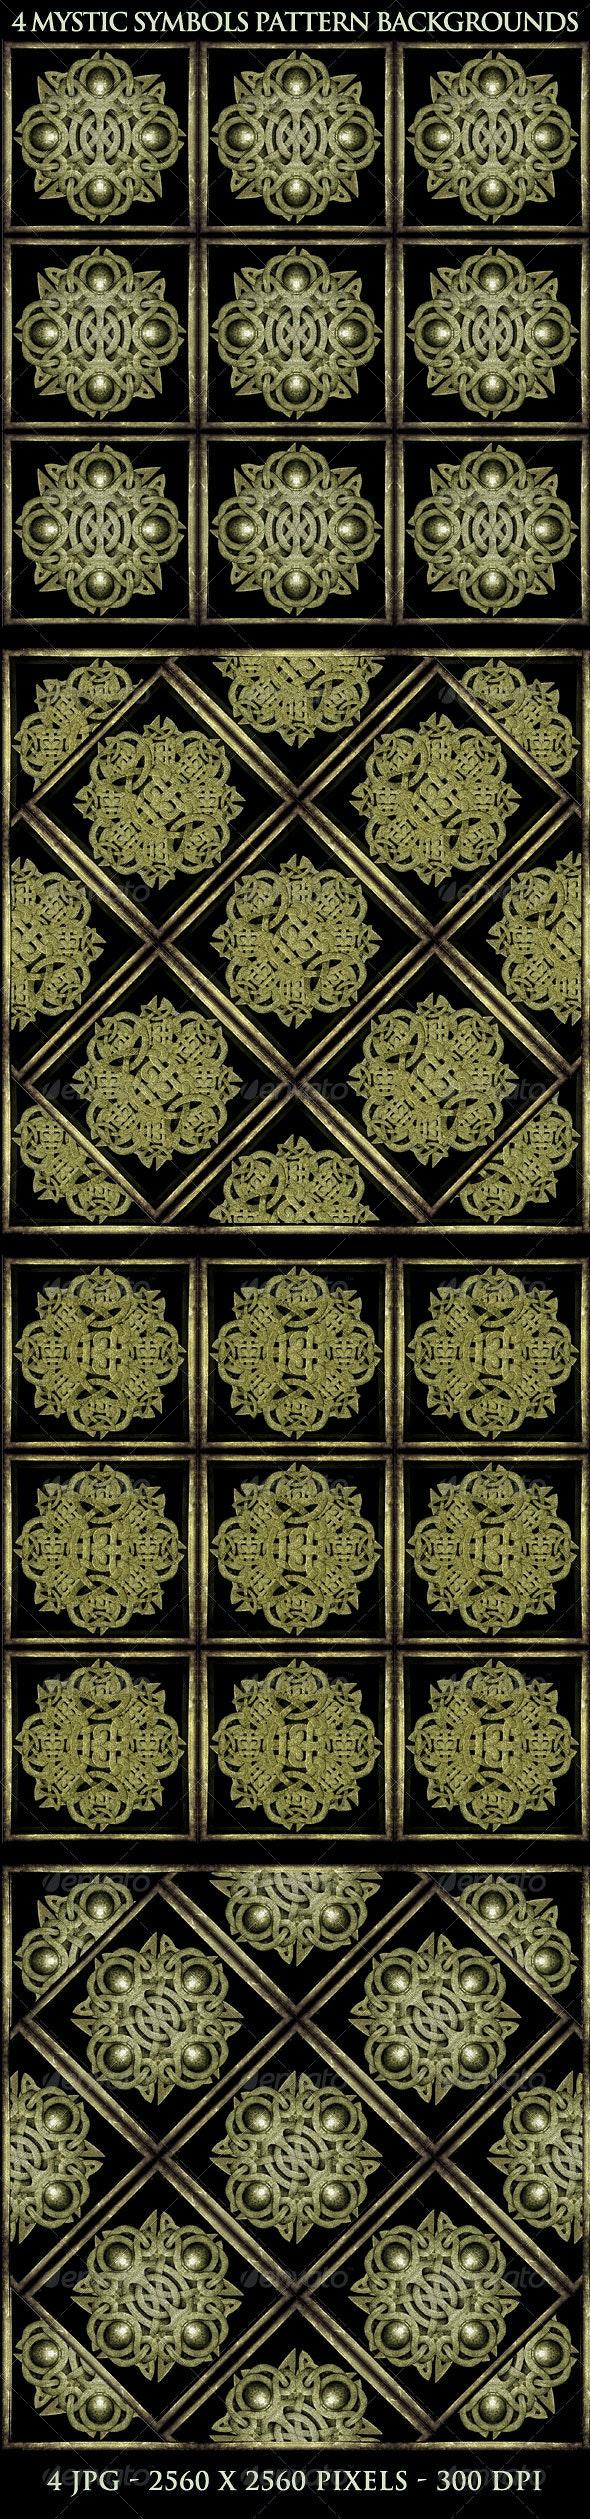 4 Mystic Symbols Background Patterns